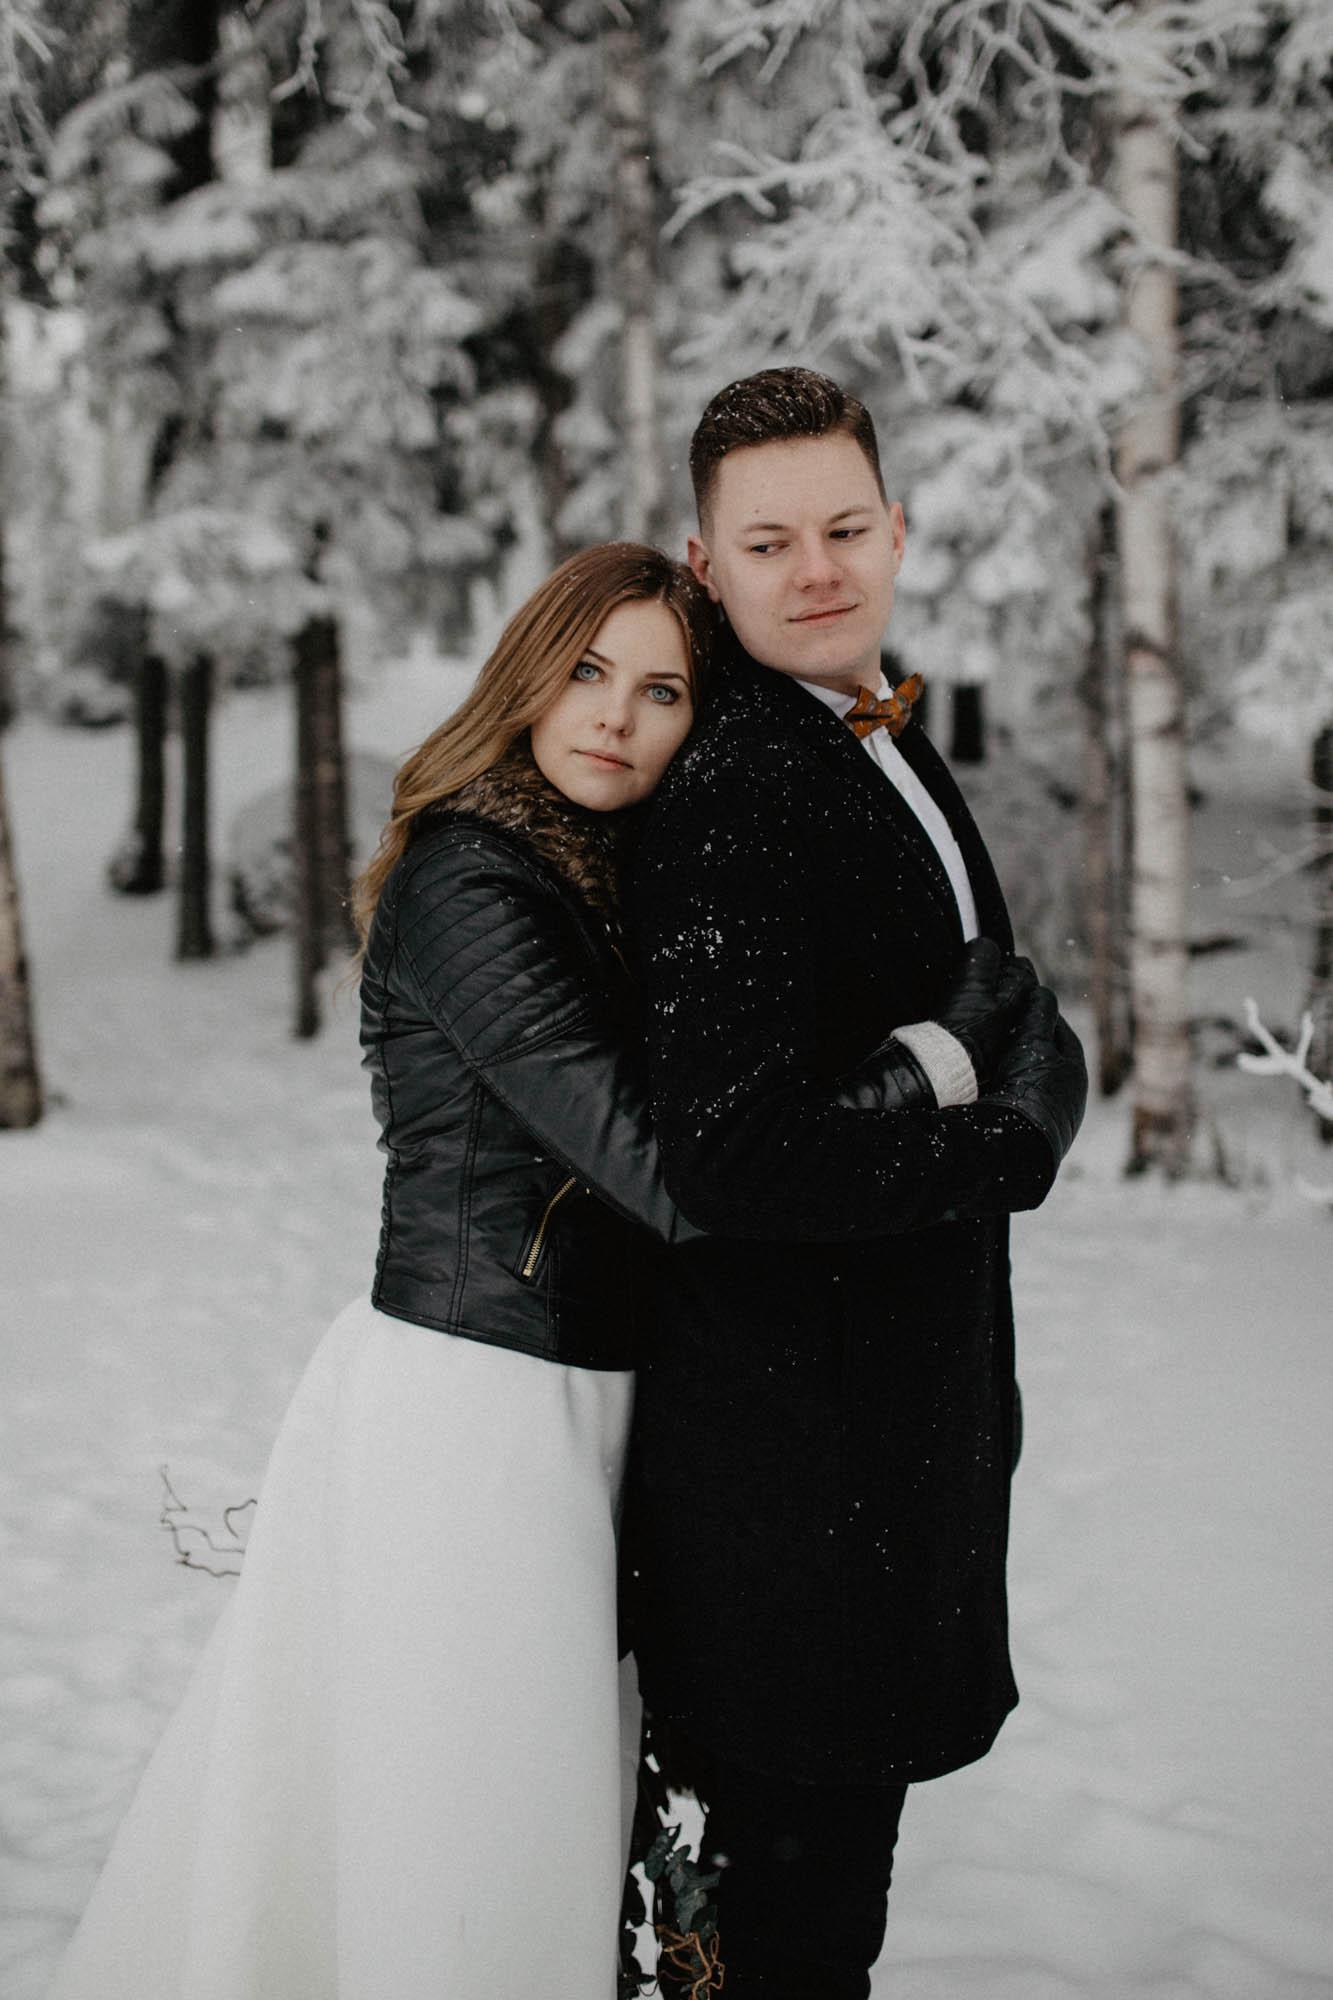 ashley_schulman_photography-winter_wedding_tampere-40.jpg